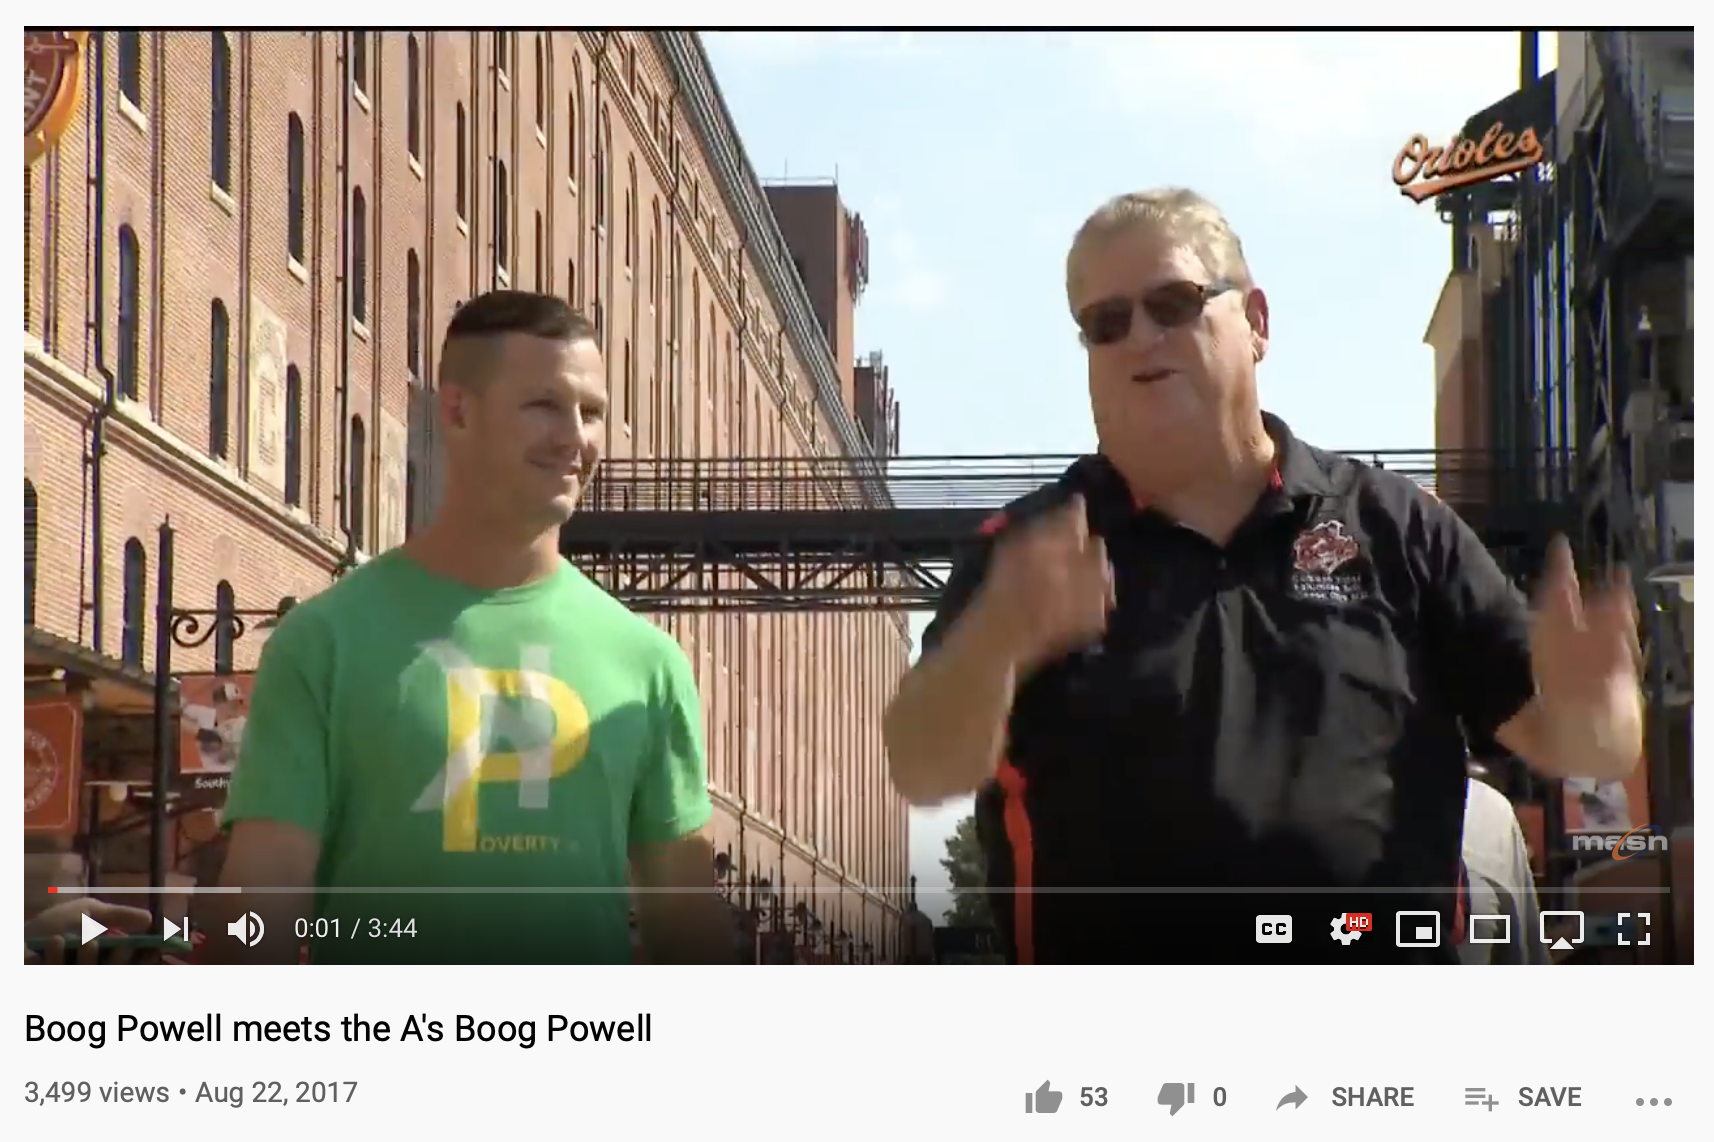 Boog Powell Meets Boog Powell